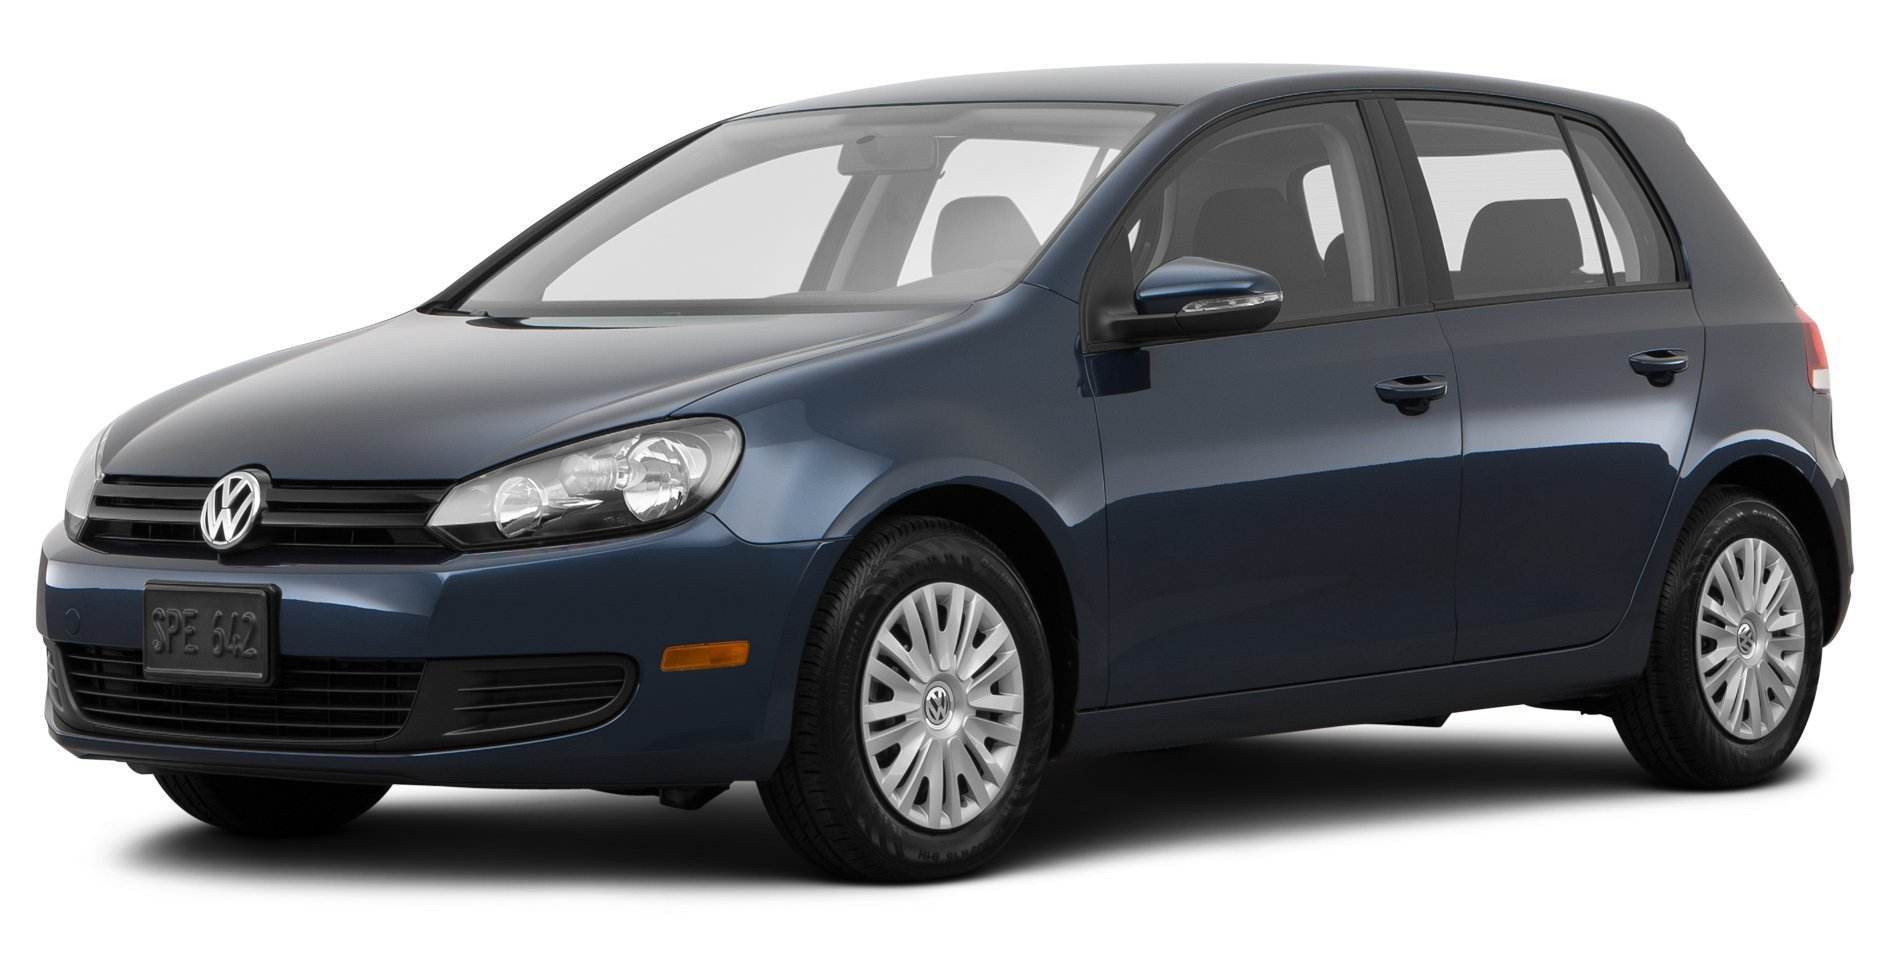 Cruze chevy cruze 2013 oil change : Amazon.com: 2014 Chevrolet Cruze Reviews, Images, and Specs: Vehicles